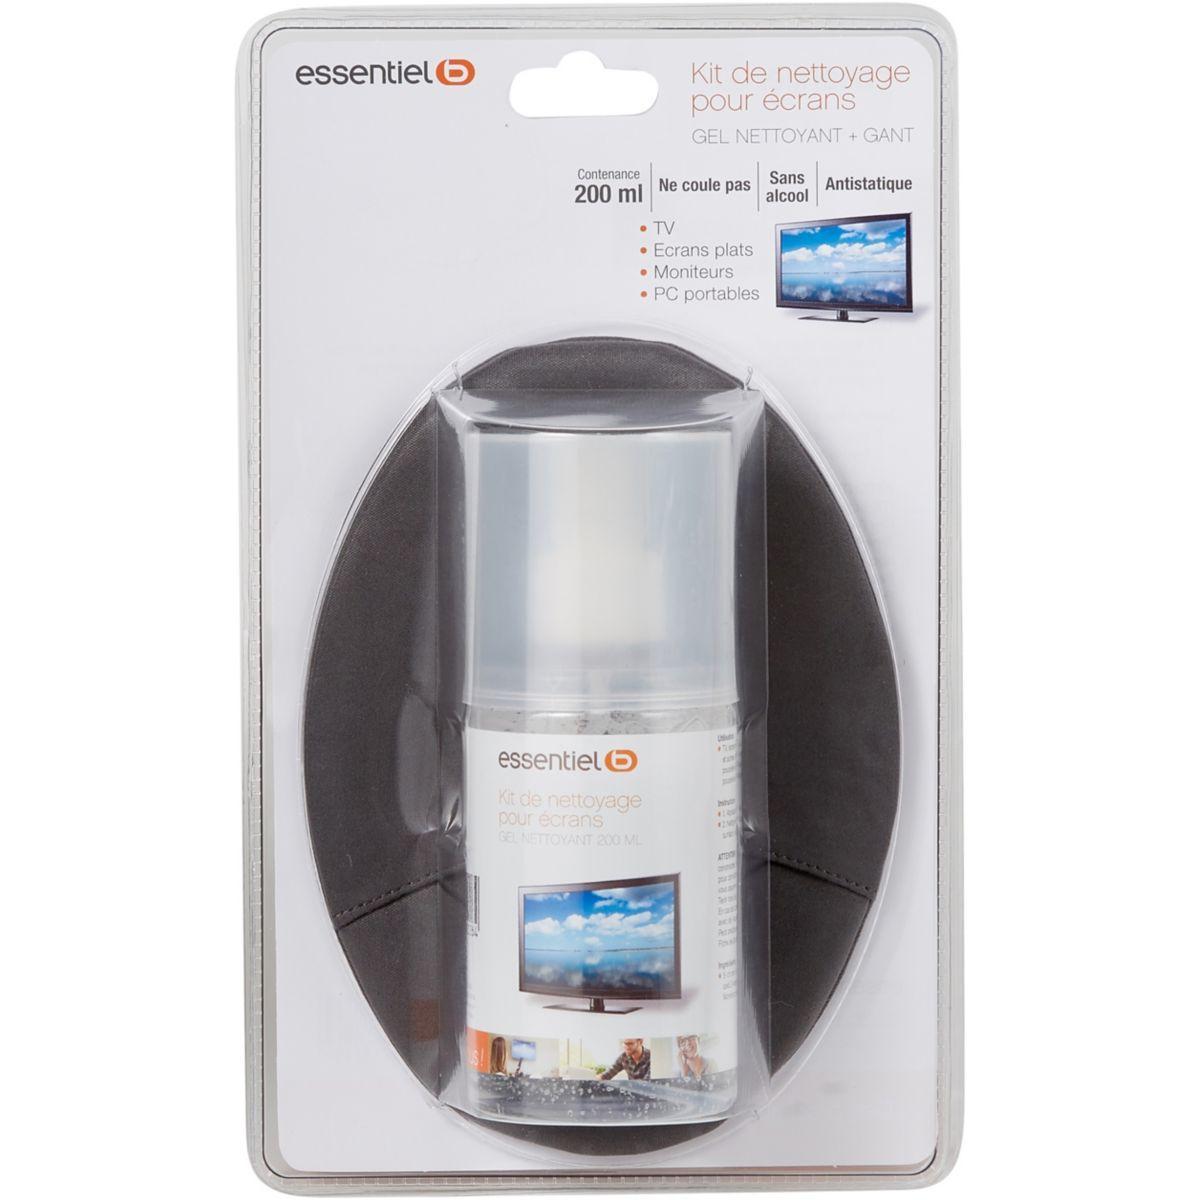 Kit sc gel 200ml+gant - produit coup de coeur webdistrib.com !